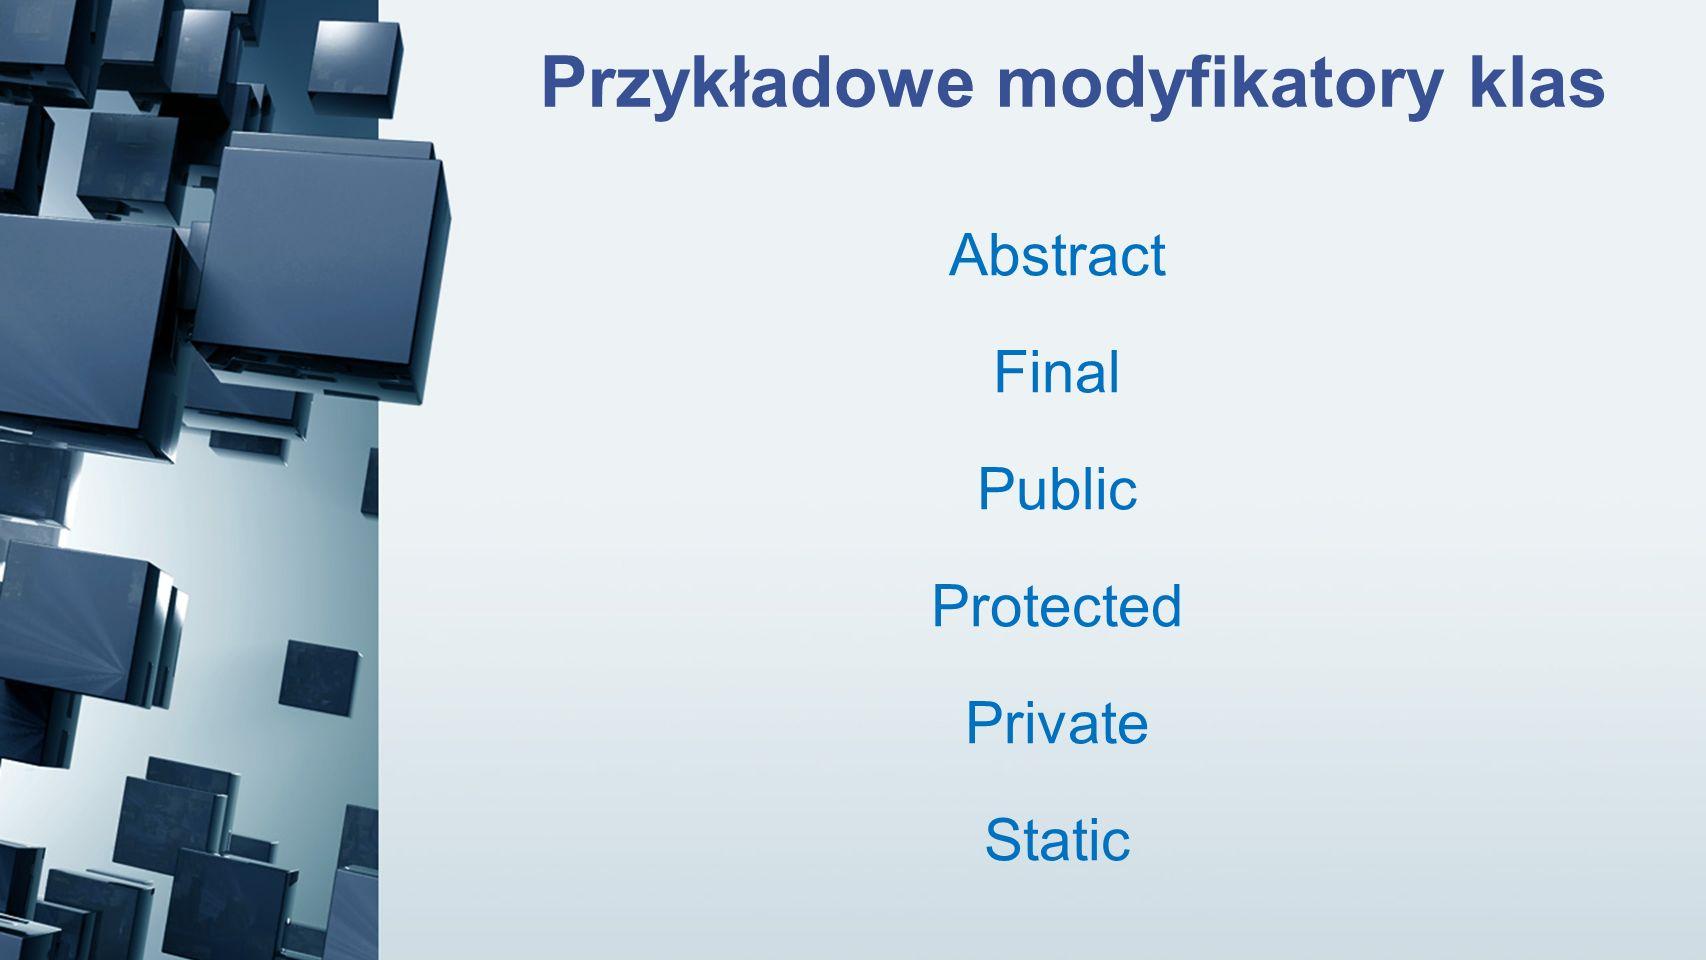 Przykładowe modyfikatory klas Abstract Final Public Protected Private Static